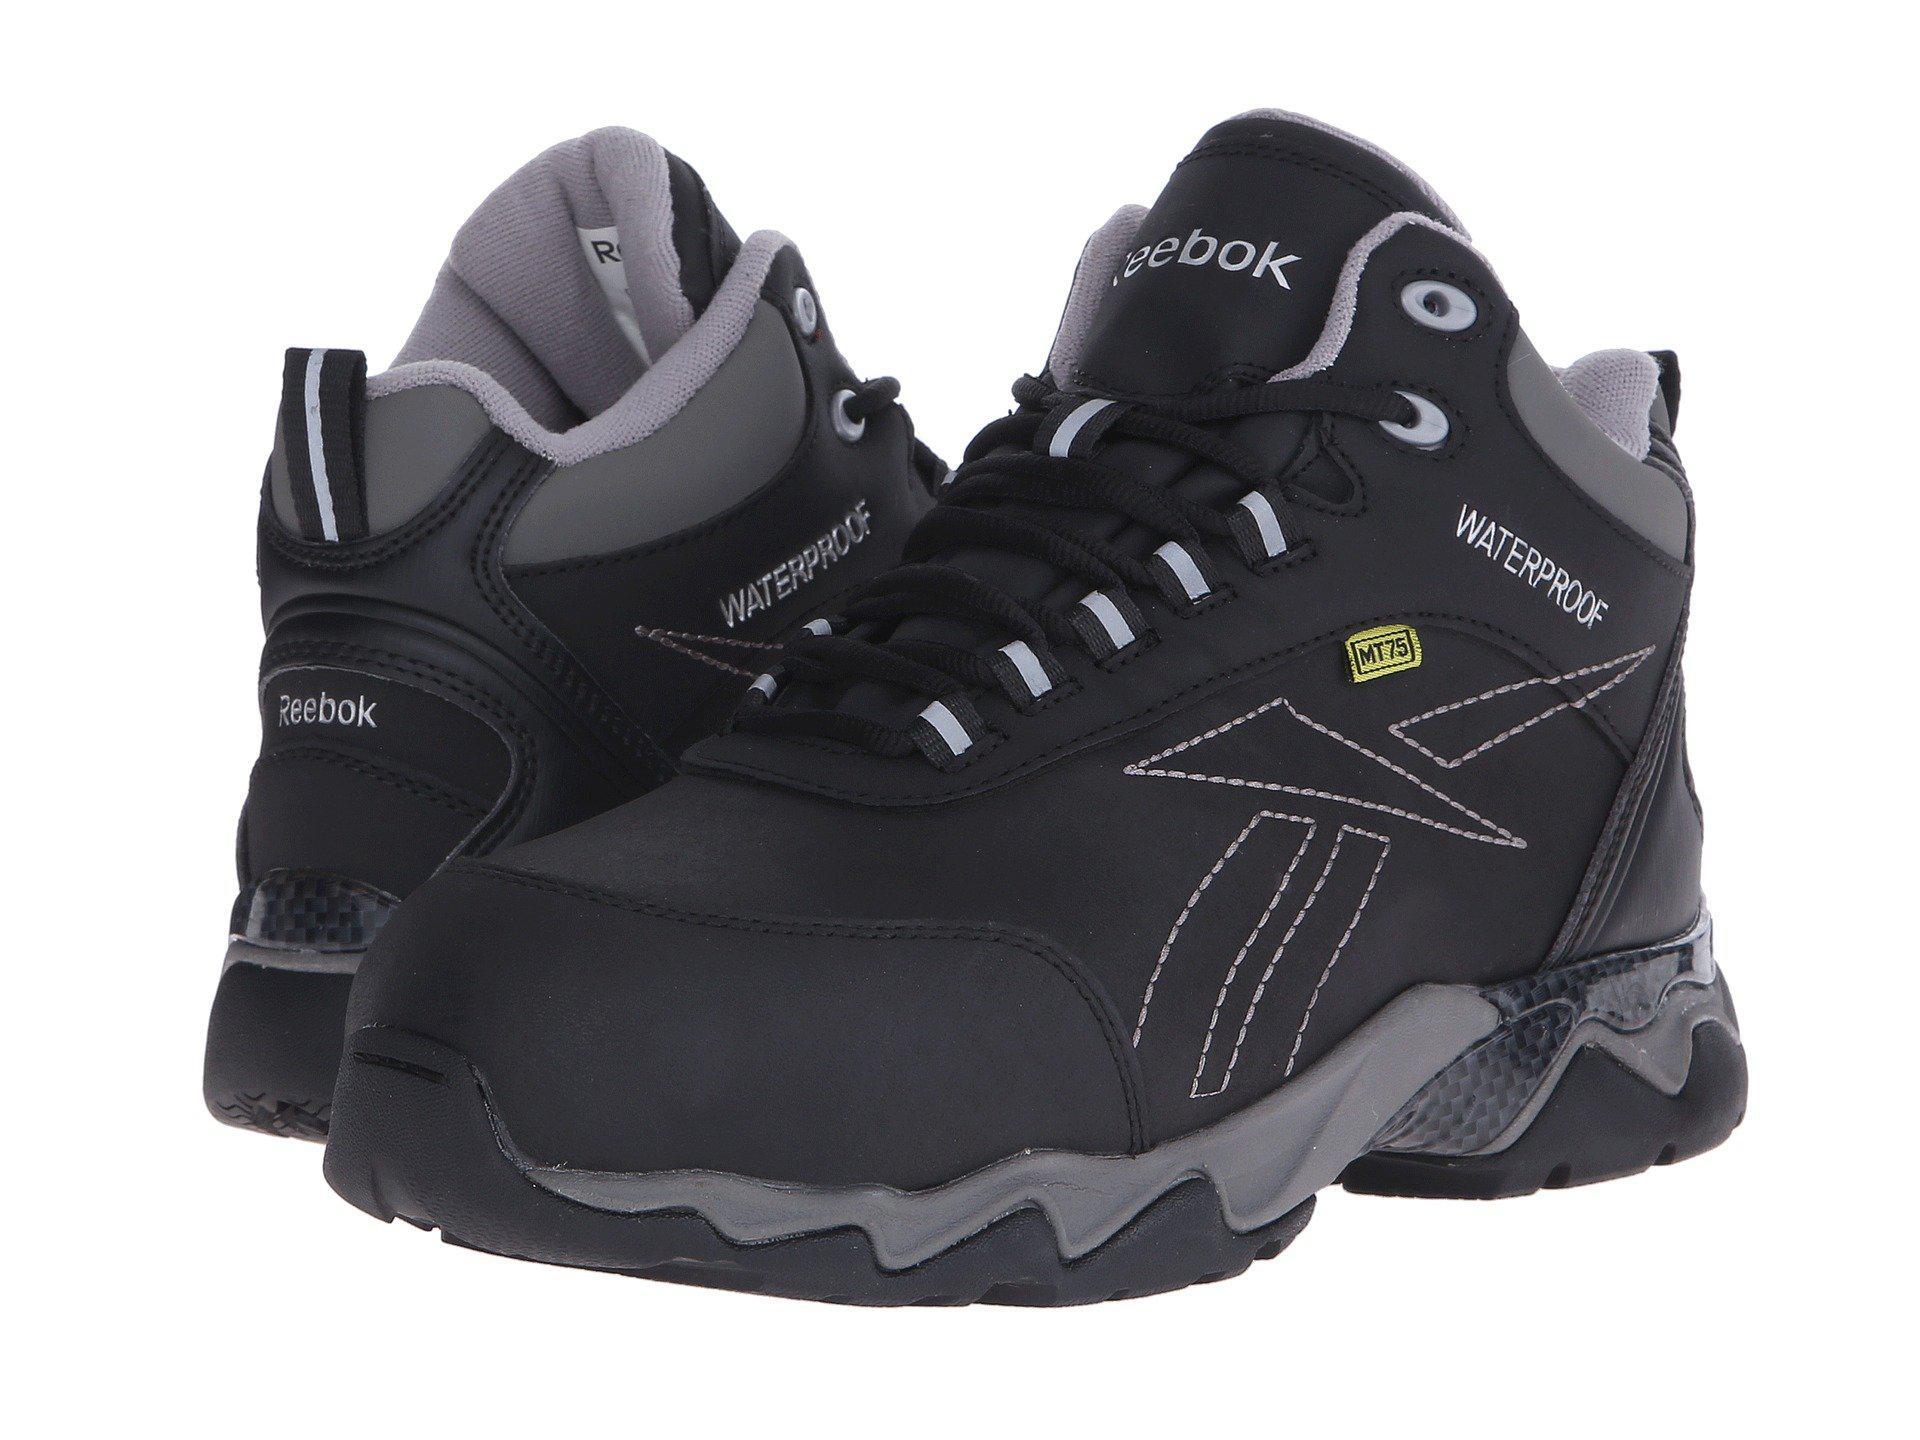 Lyst - Reebok Beamer (black) Men s Work Boots in Black for Men 755dfe030